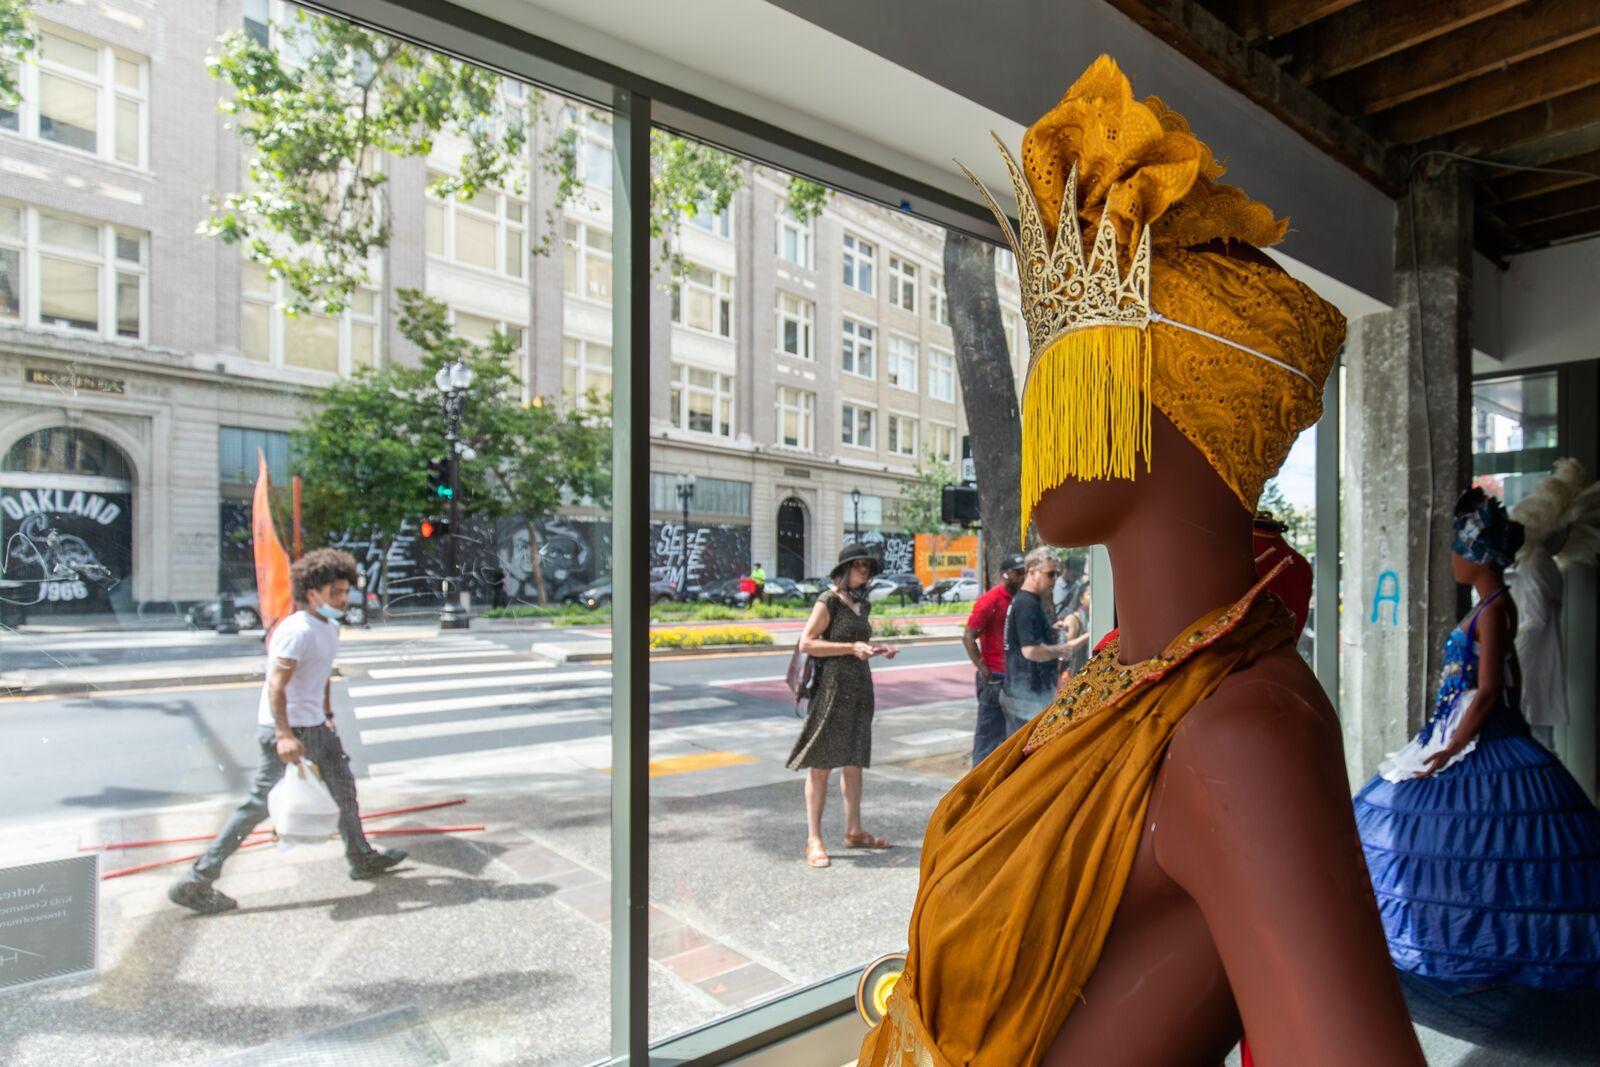 In downtown Oakland, 30+ storefronts display art celebrating Black joy